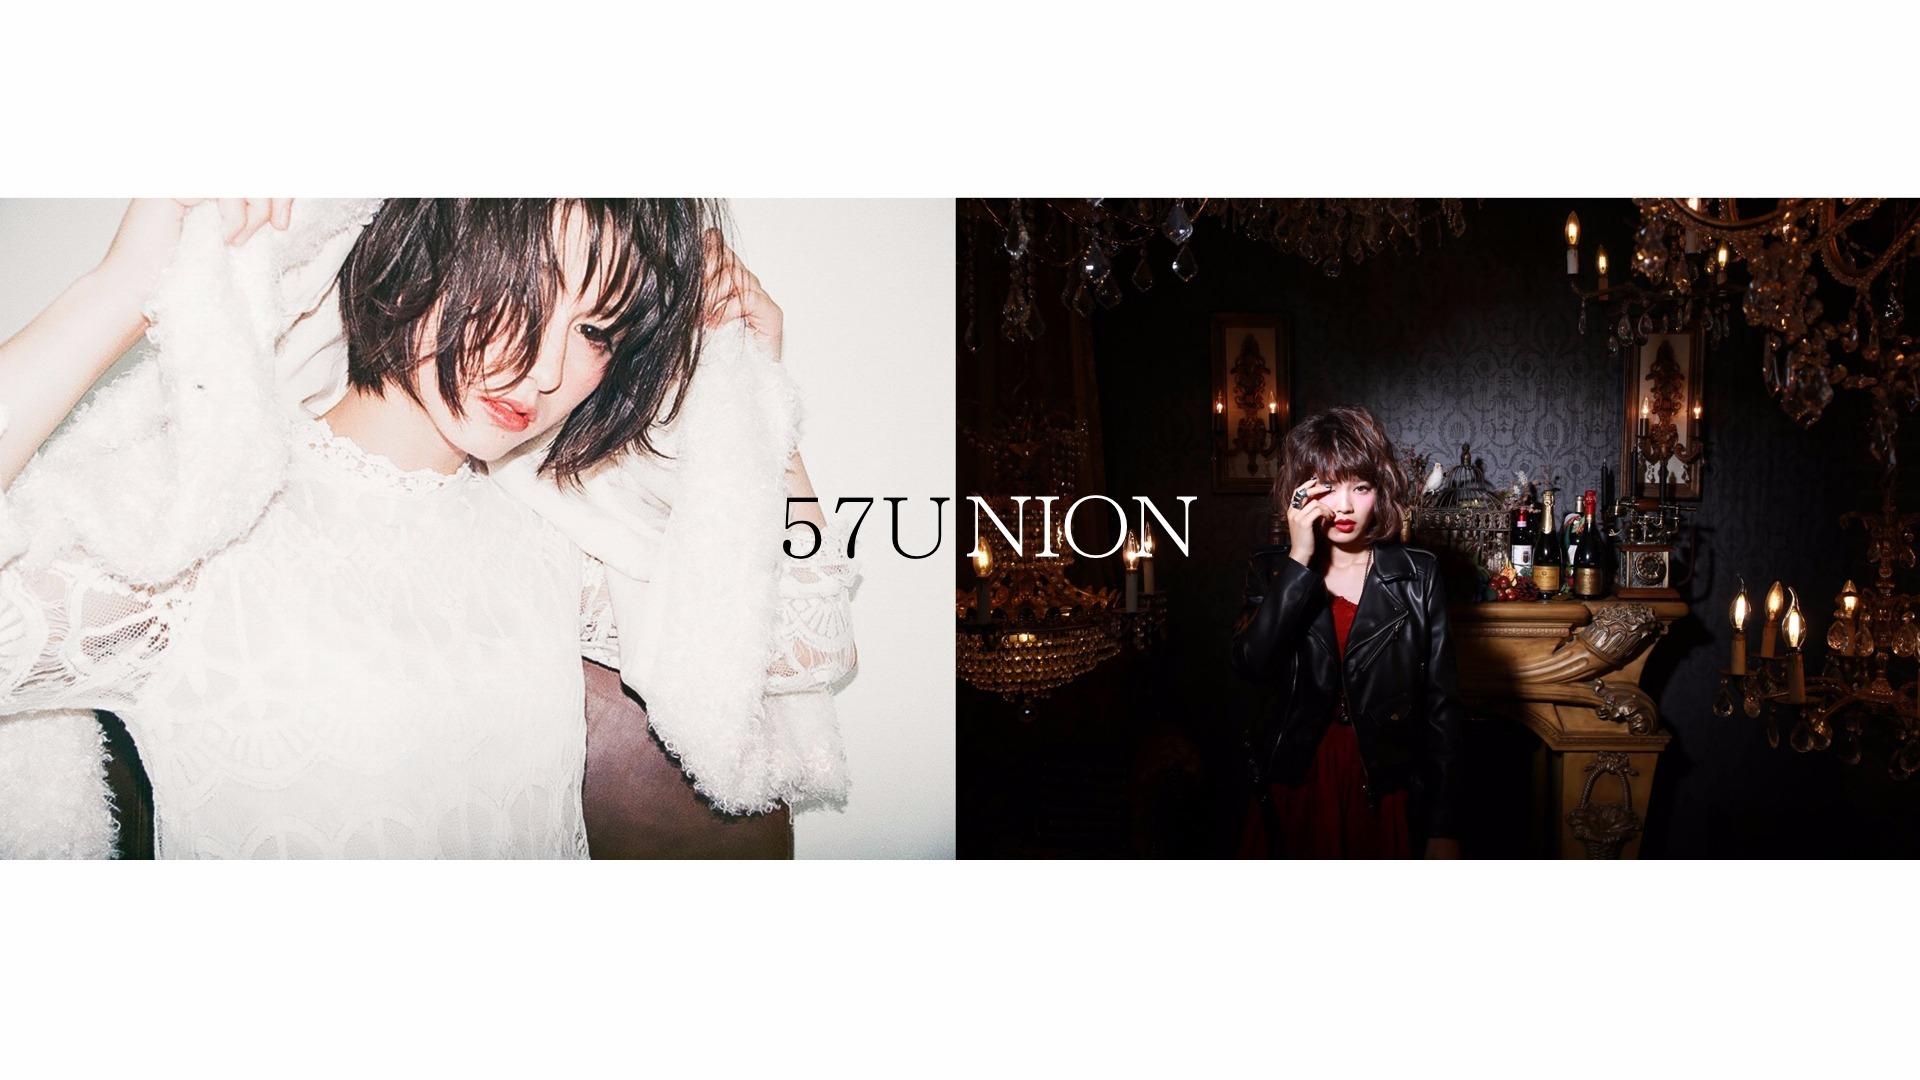 57UNION(ゴーナナユニオン)~ カメラ美容師によるサロン戦略 ~